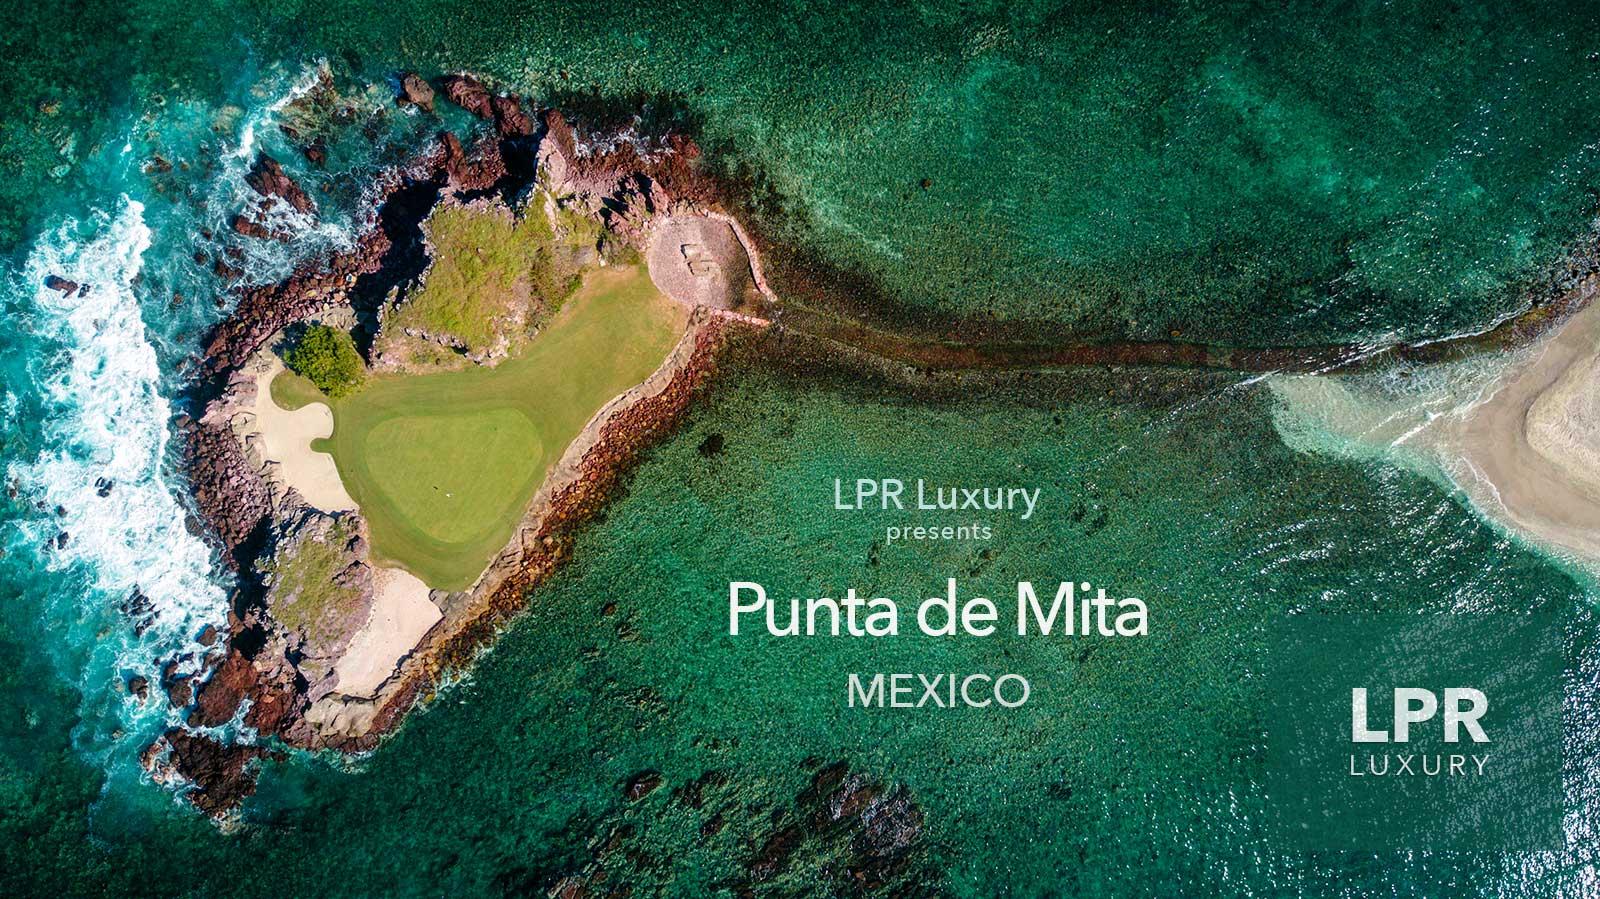 Explore LPR Luxury - Only the best Luxury Punta de Mita villas for sale and rent